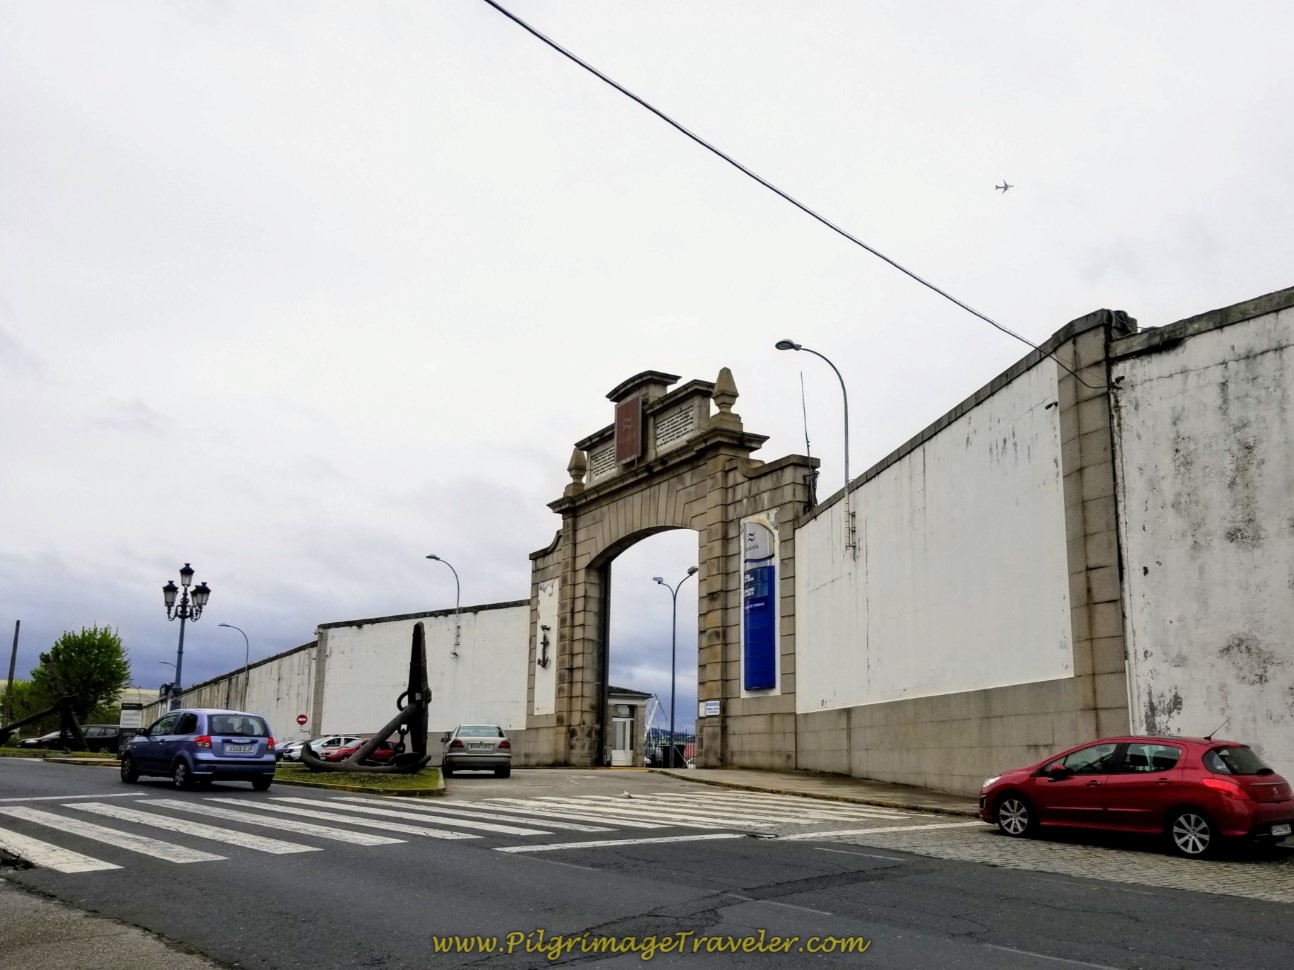 Navantia Shipyard Entrance on the Rúa Taxonera on day one of the Camino Inglés